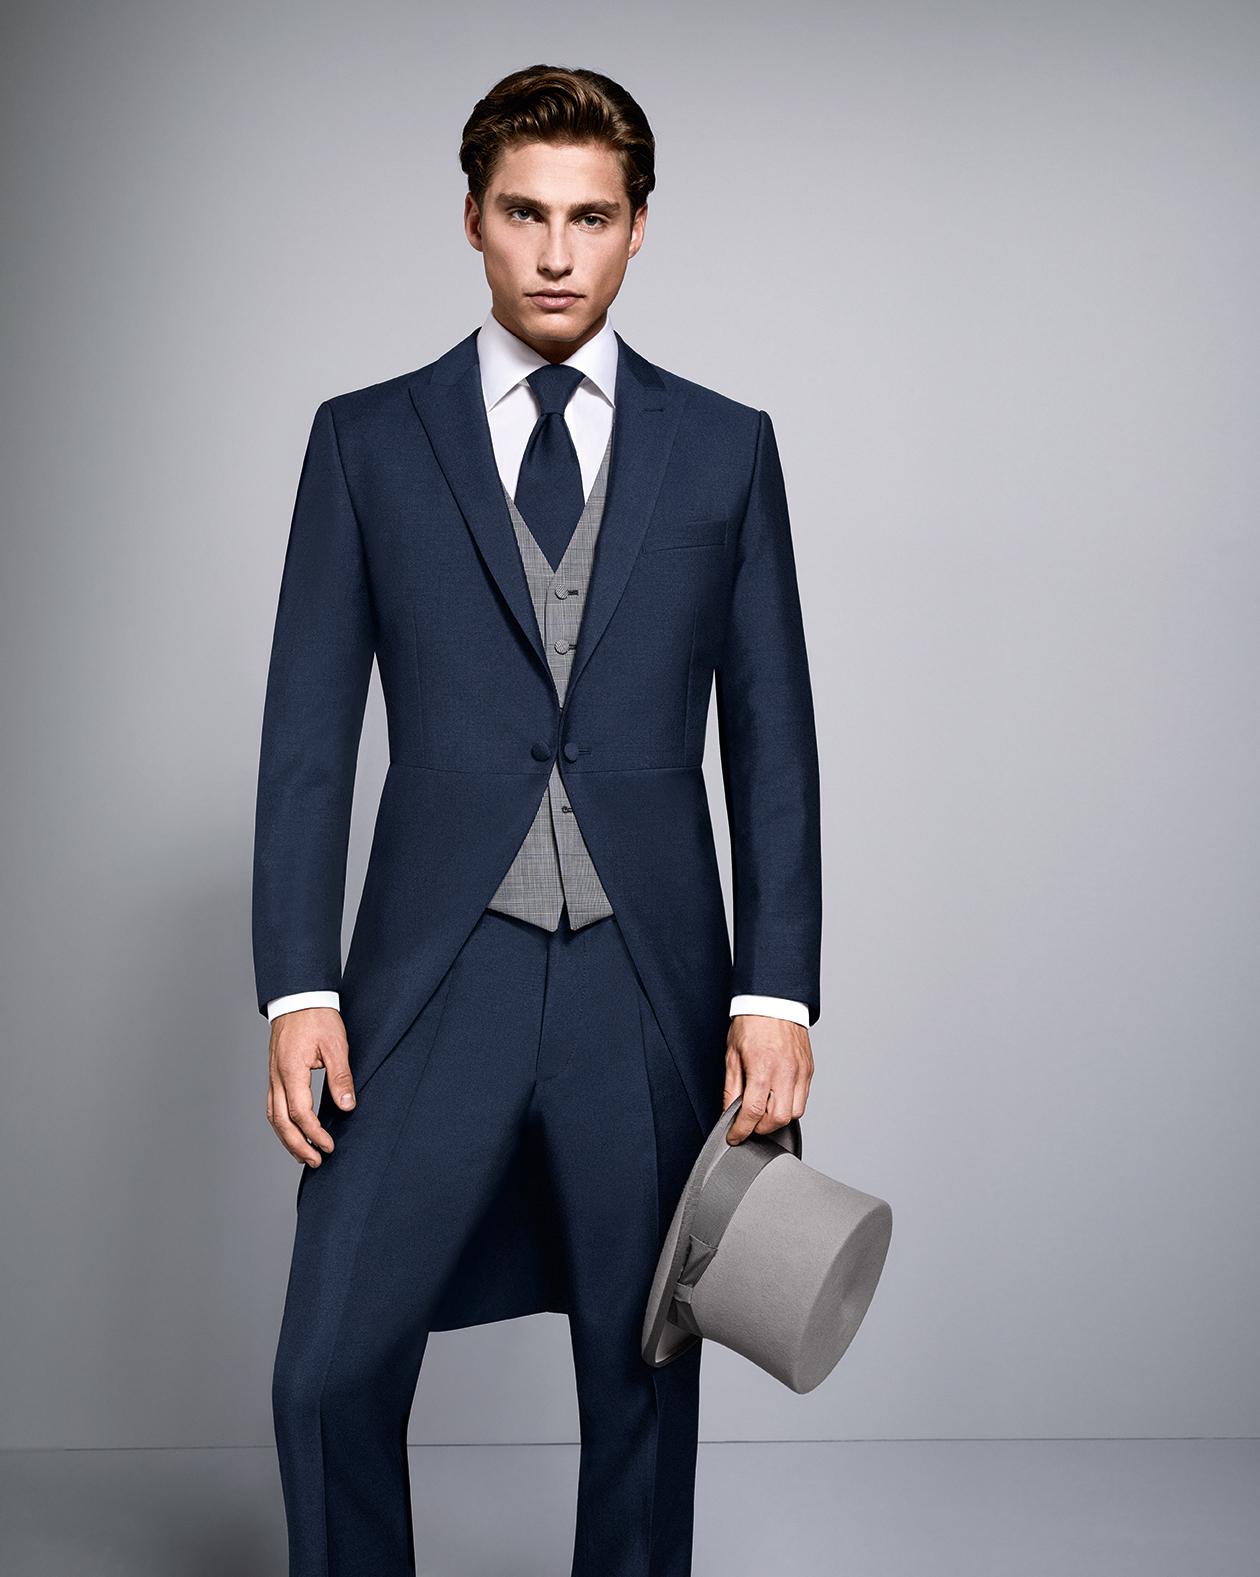 Blue evening tail outfit tom murphy 39 s formal and menswear - Hochzeitsanzug hugo boss ...